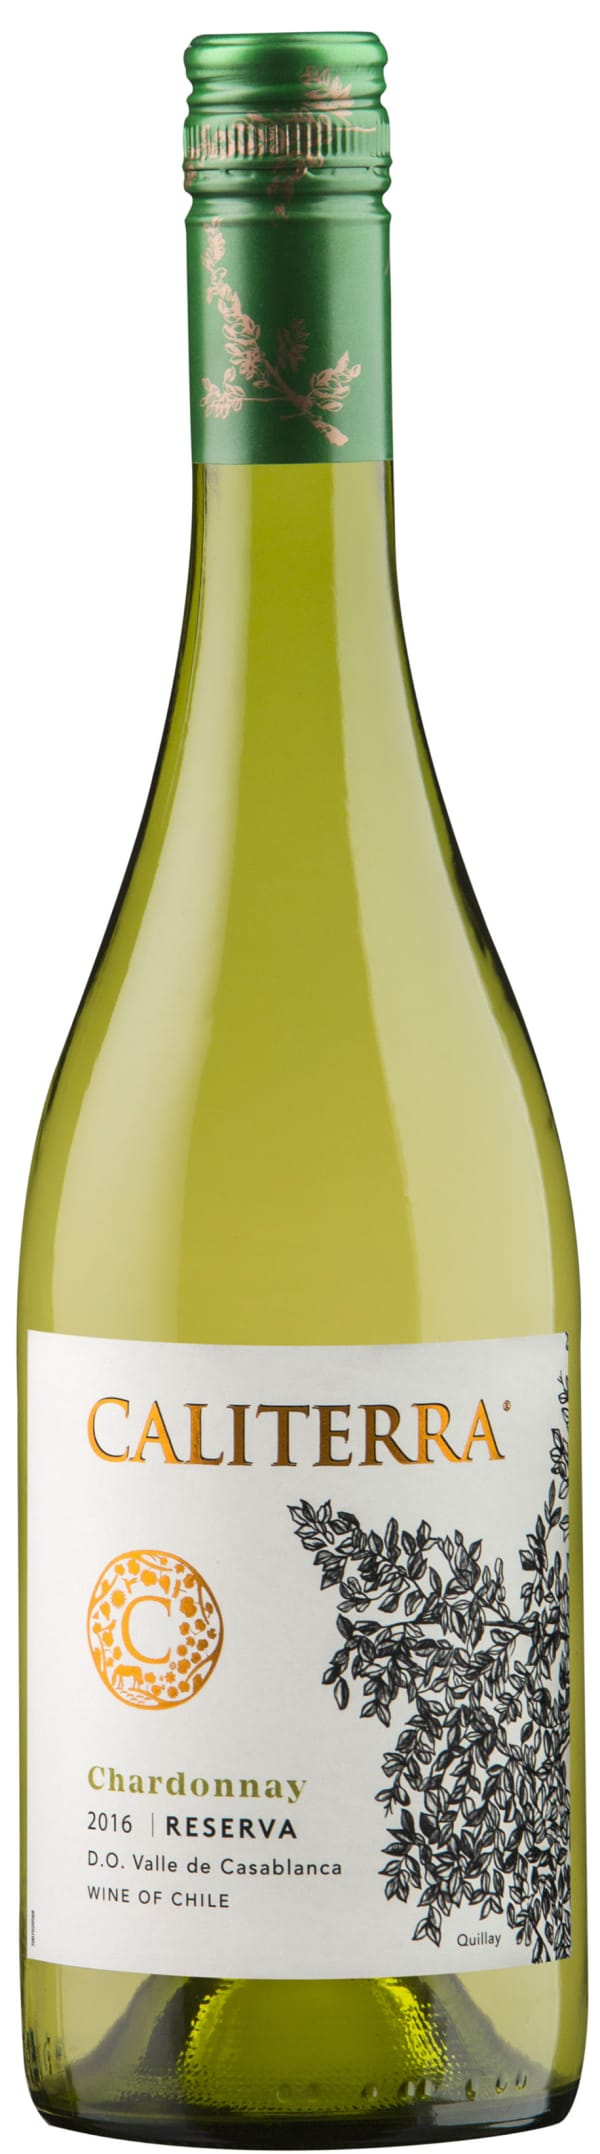 Caliterra Reserva Chardonnay 2016